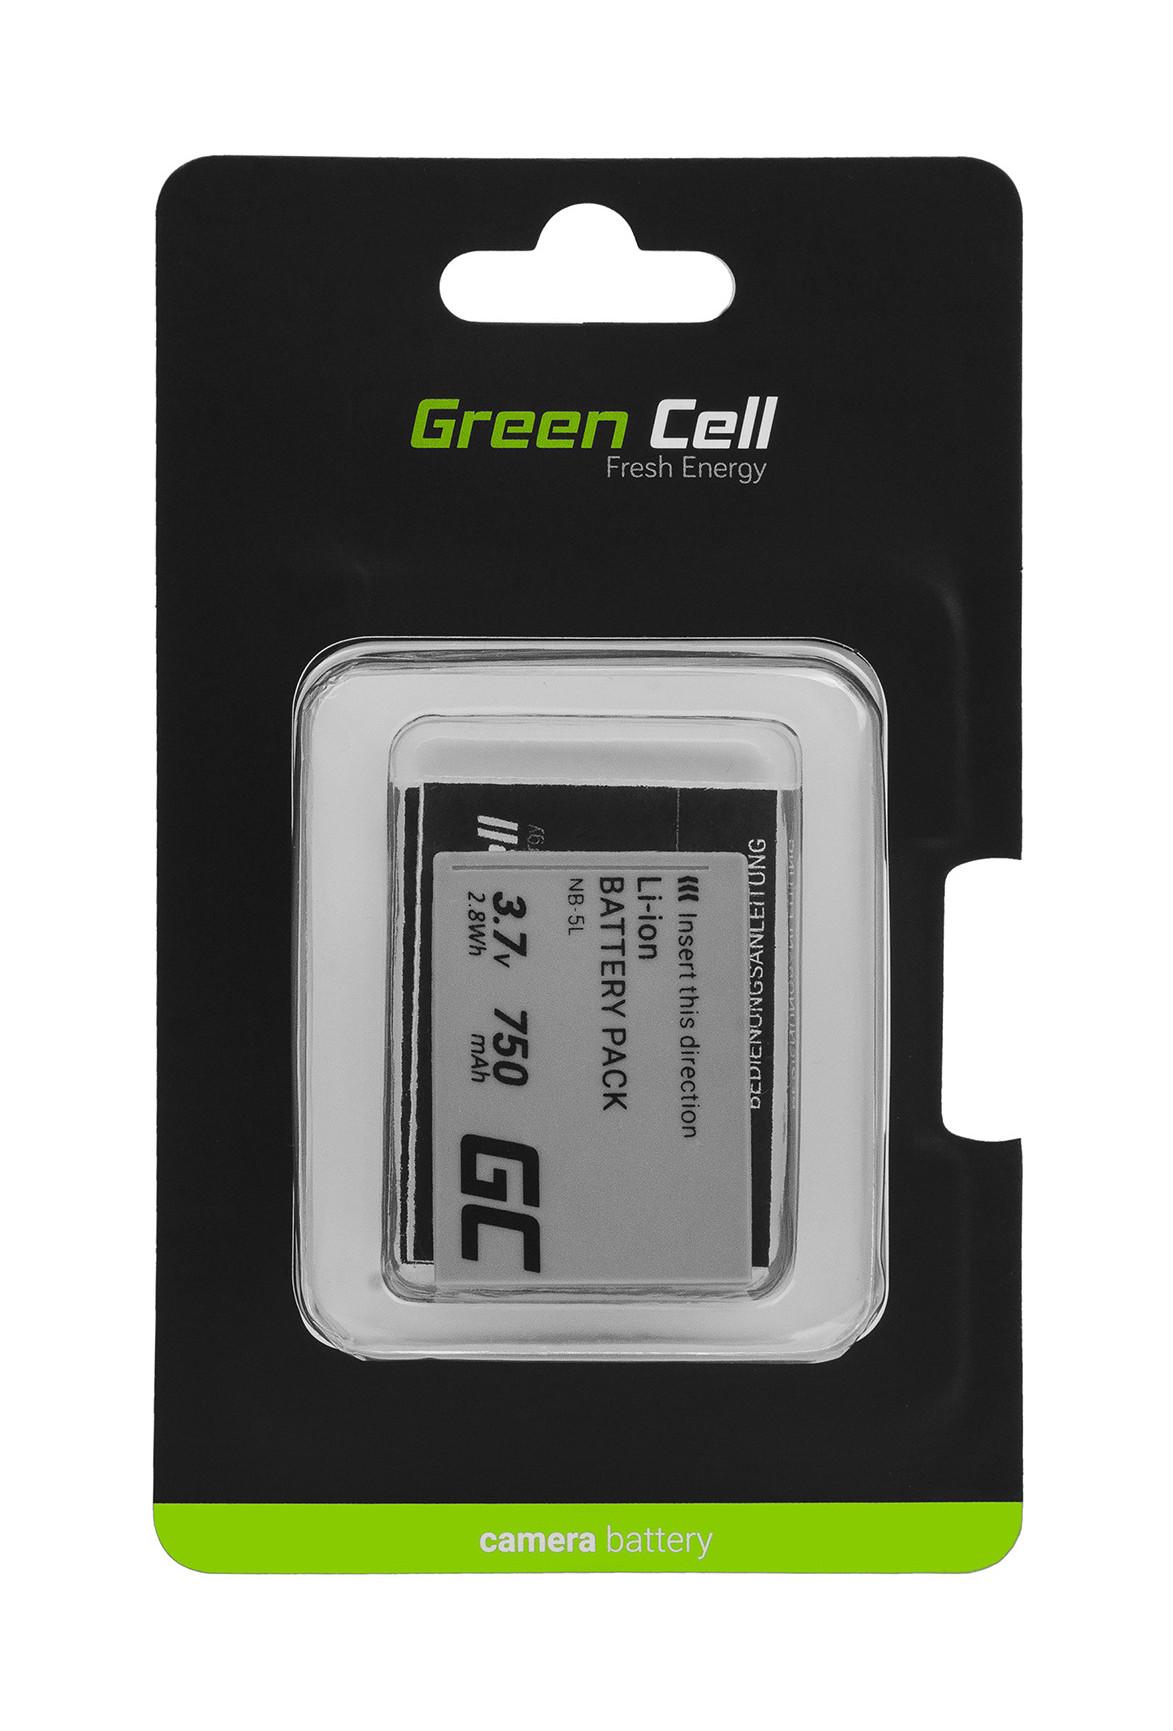 NB-5L Green Cell Camera Battery for Canon Digital IXUS 800 860 Digital IXY 800 2000 Powershot S110 SD790